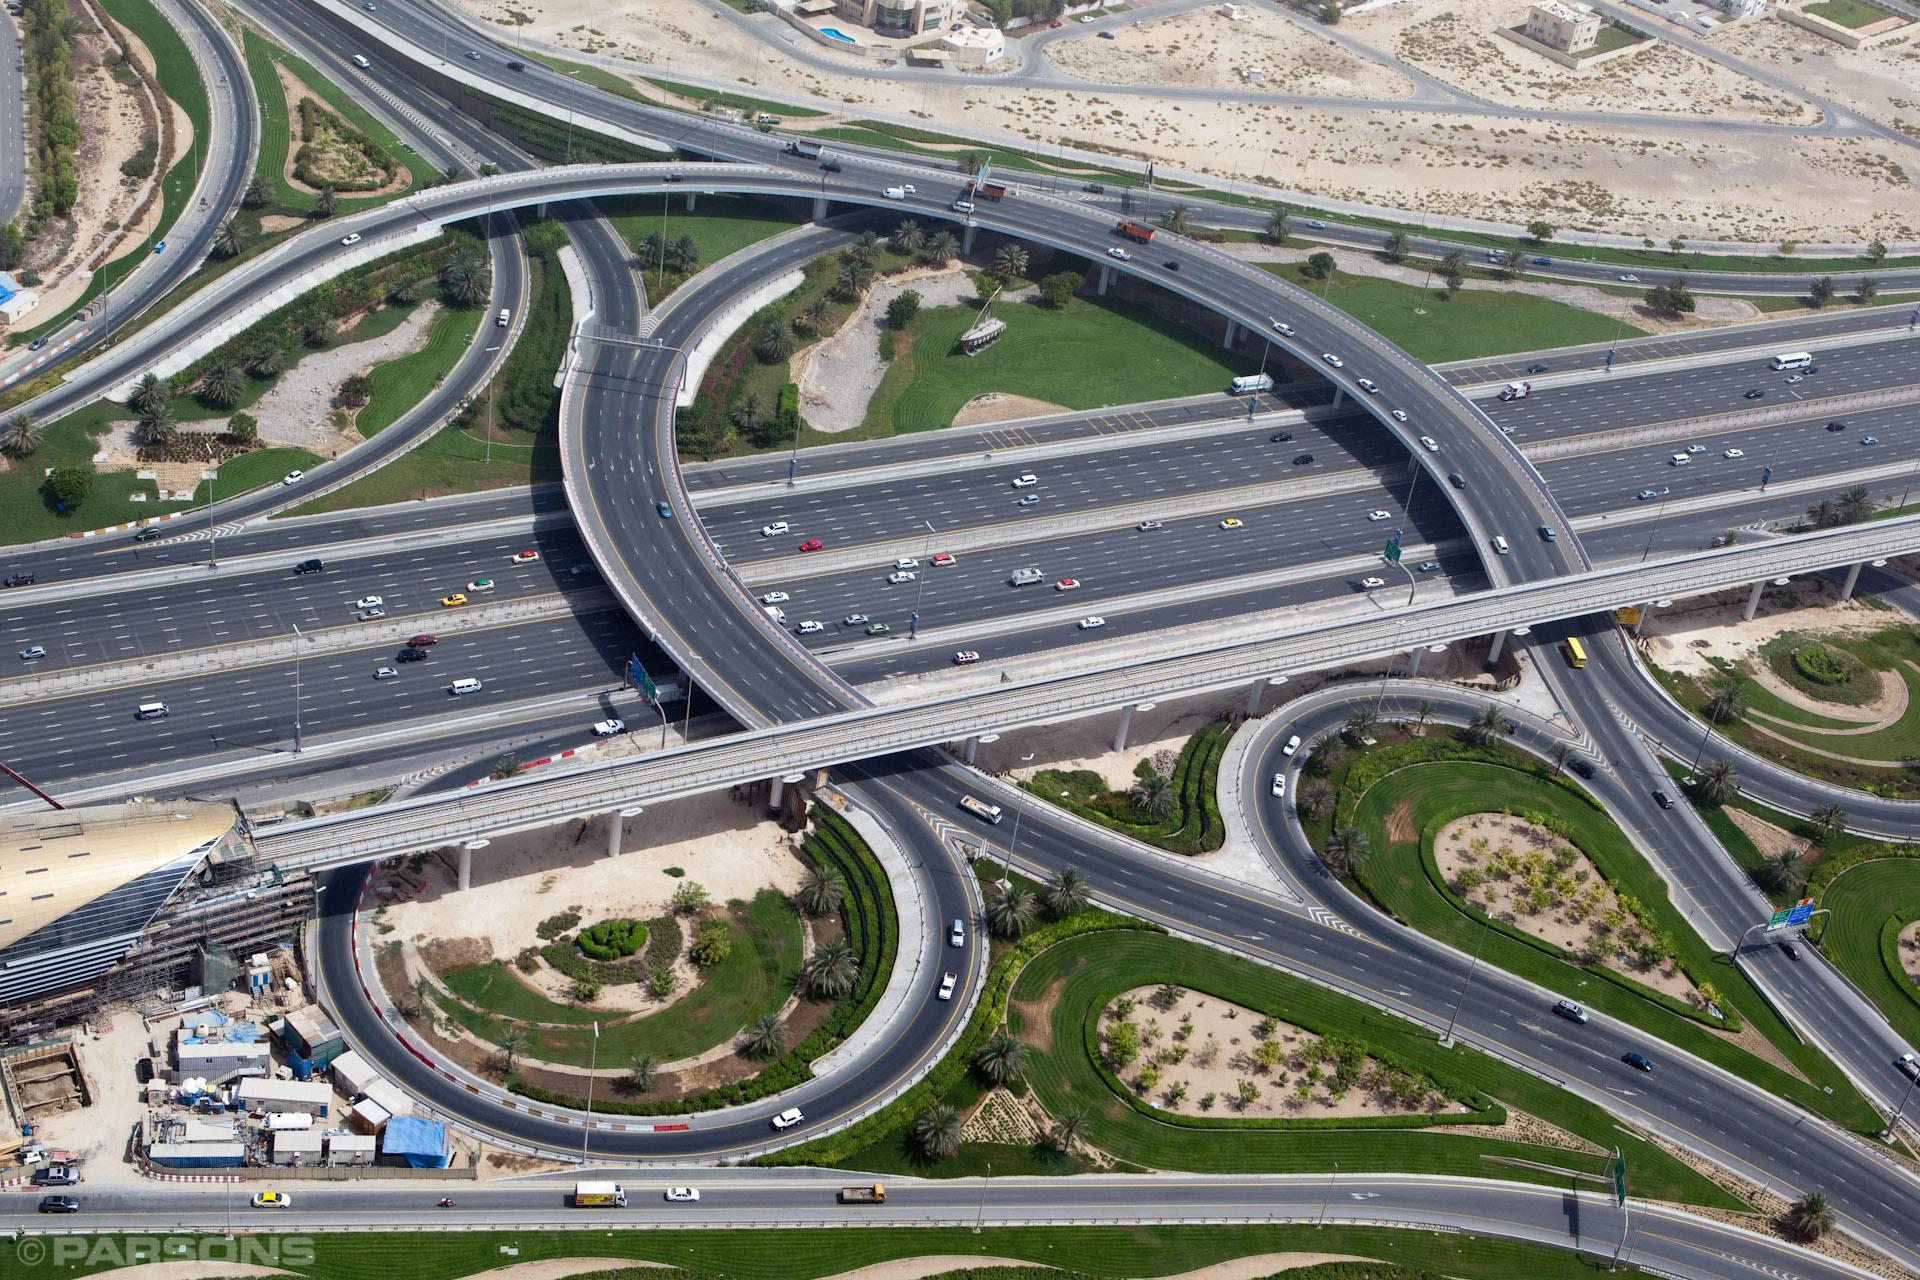 Civil-Engineering-Aerial-Dubai-Sheihk-Zayed-Highway-UAE-1.JPG